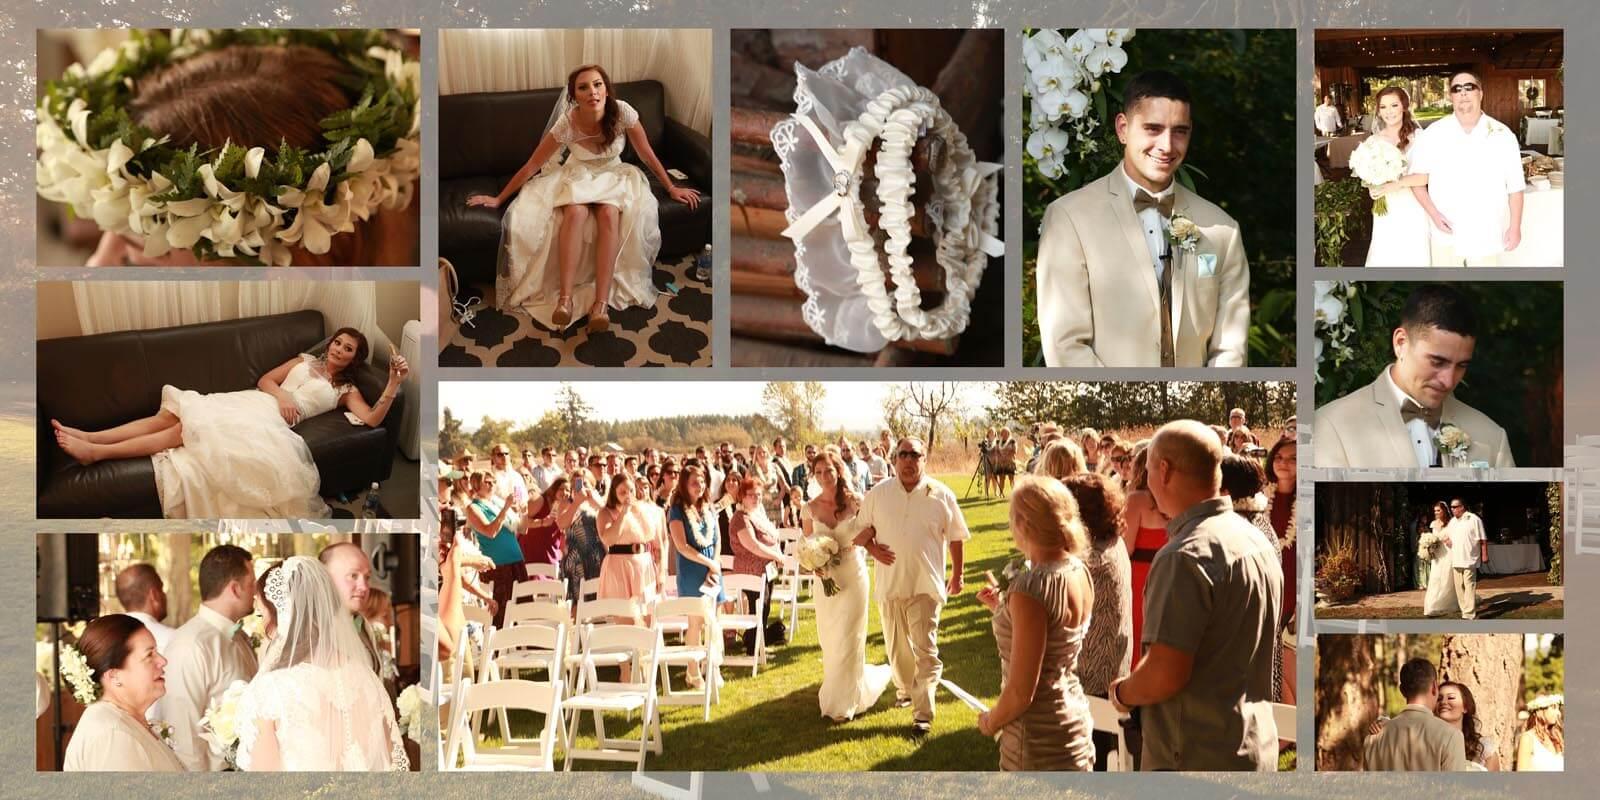 Jasper-House-Farm-Outdoor-Wedding-Lane-County-Oregon-photographers-042-043.jpg